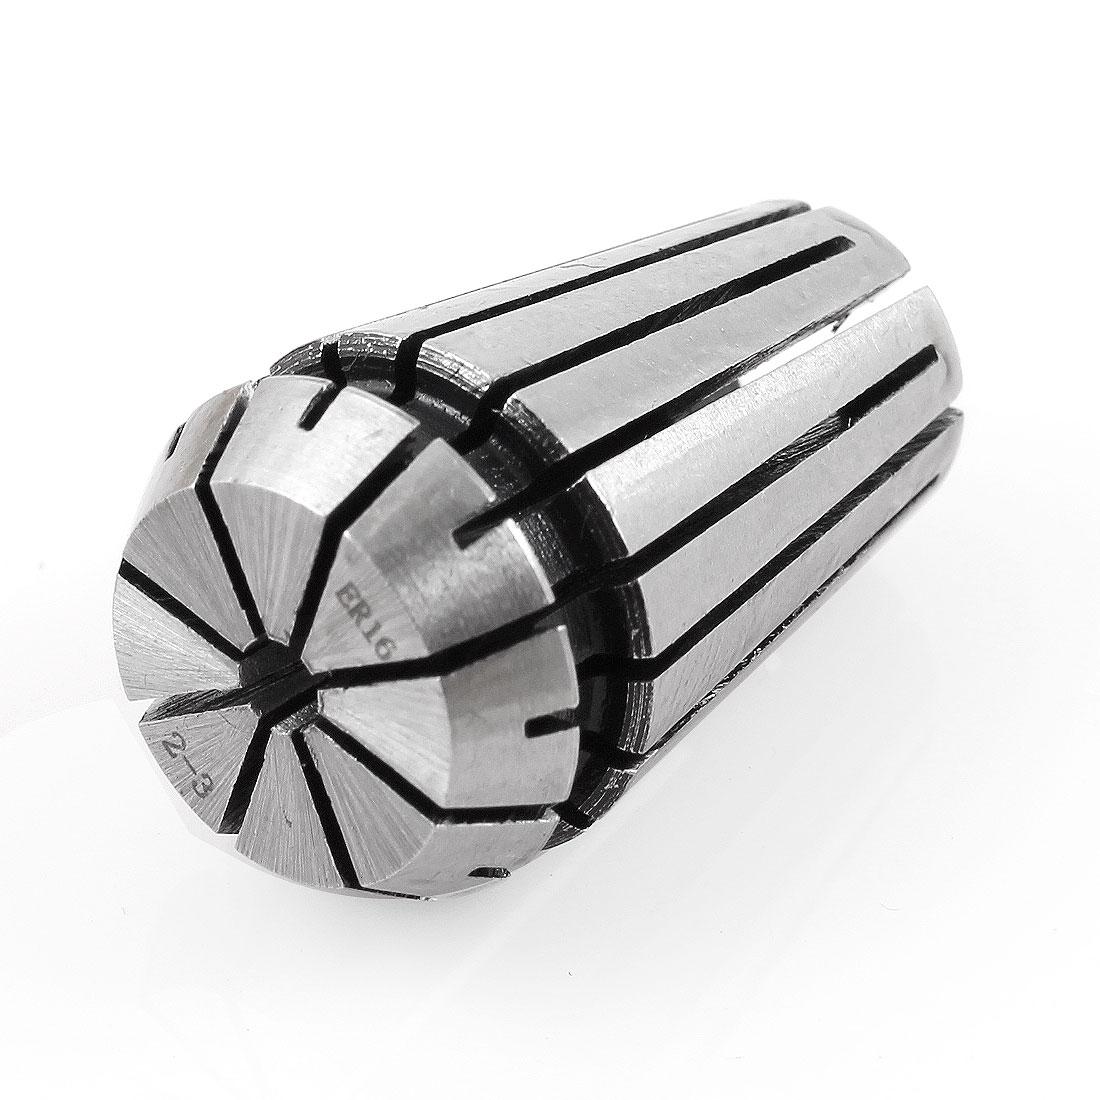 2mm -3mm Clamp Spring Collet Grinding Milling Lathe Tool ER16